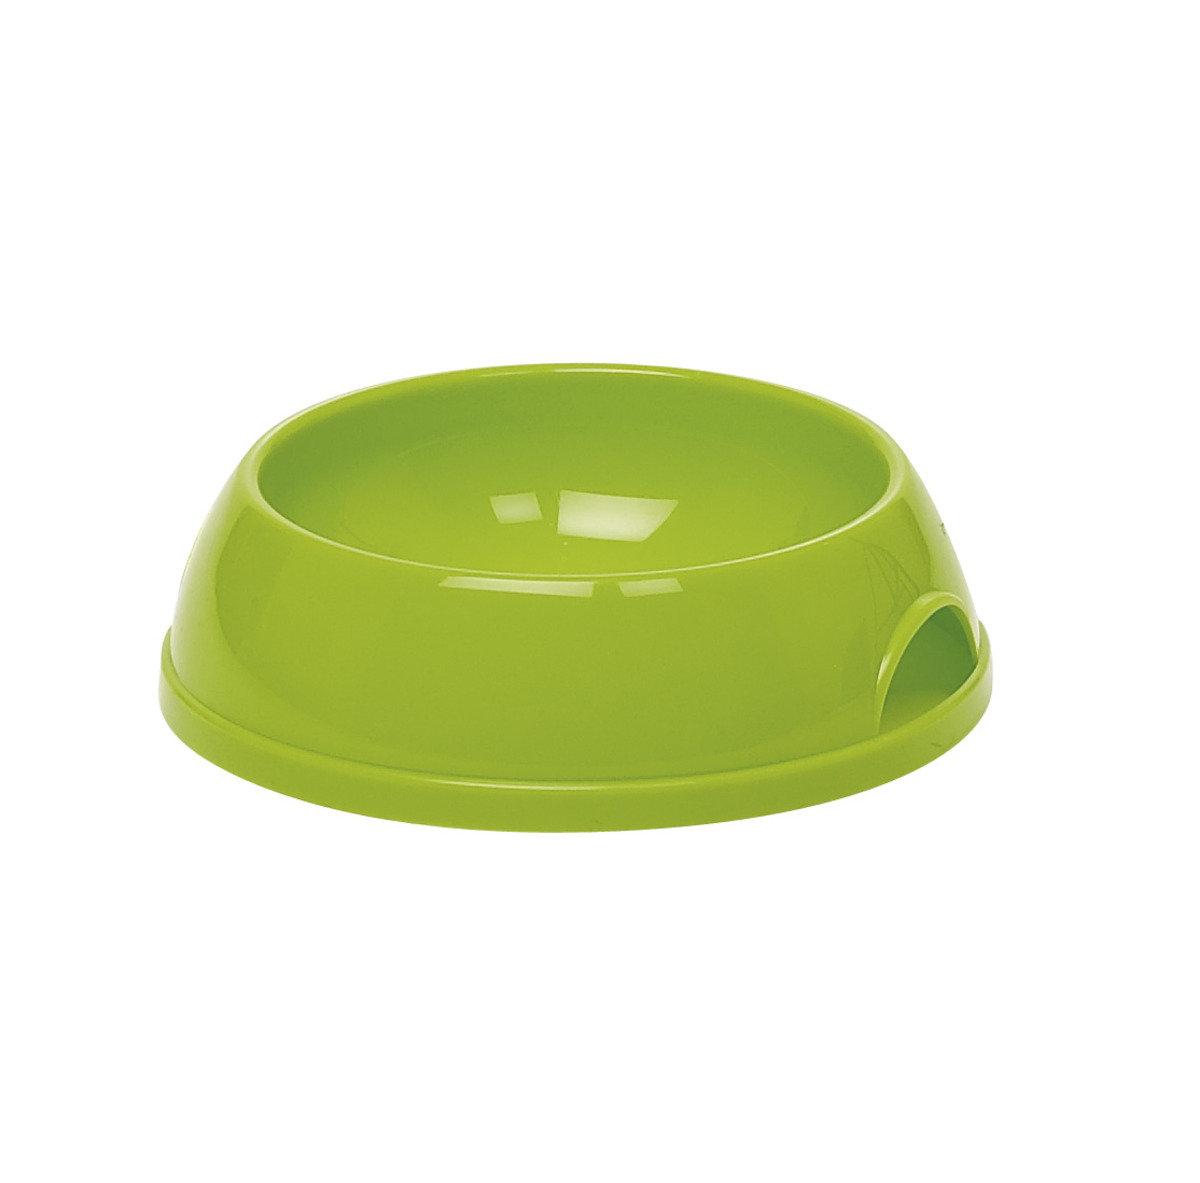 Eco Bowl  寵物碗 H110 - 淺綠色